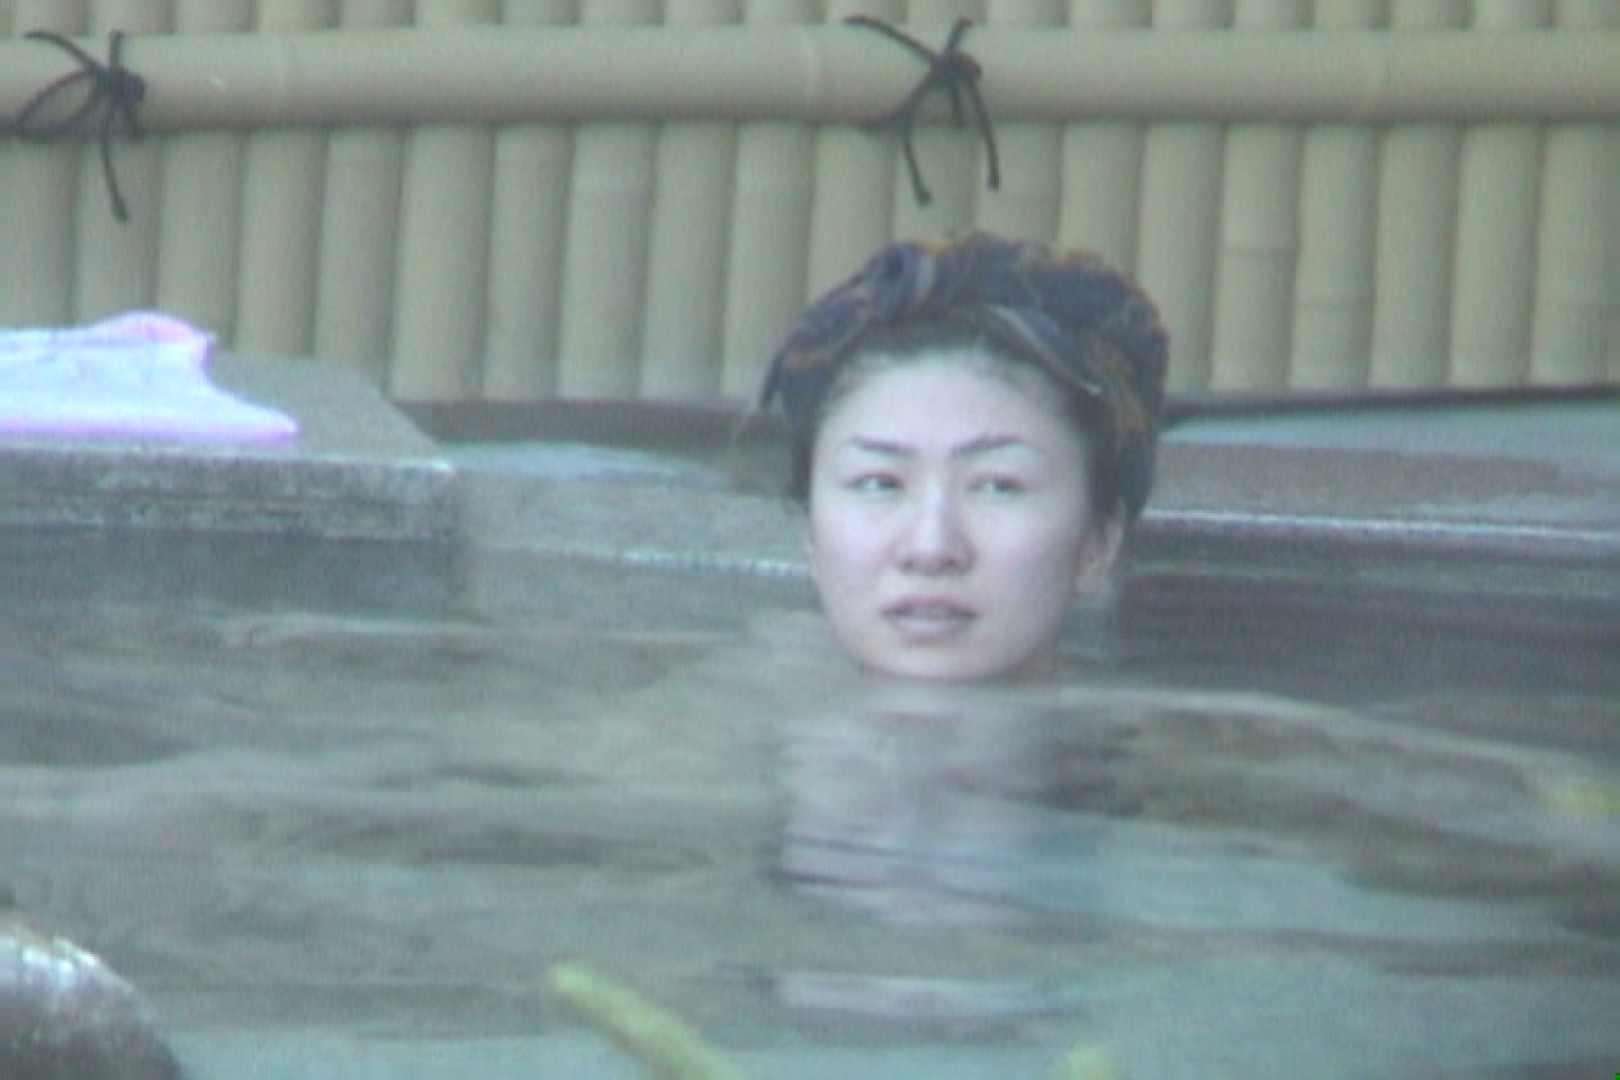 Aquaな露天風呂Vol.607 盗撮シリーズ | 露天風呂編  107PIX 5